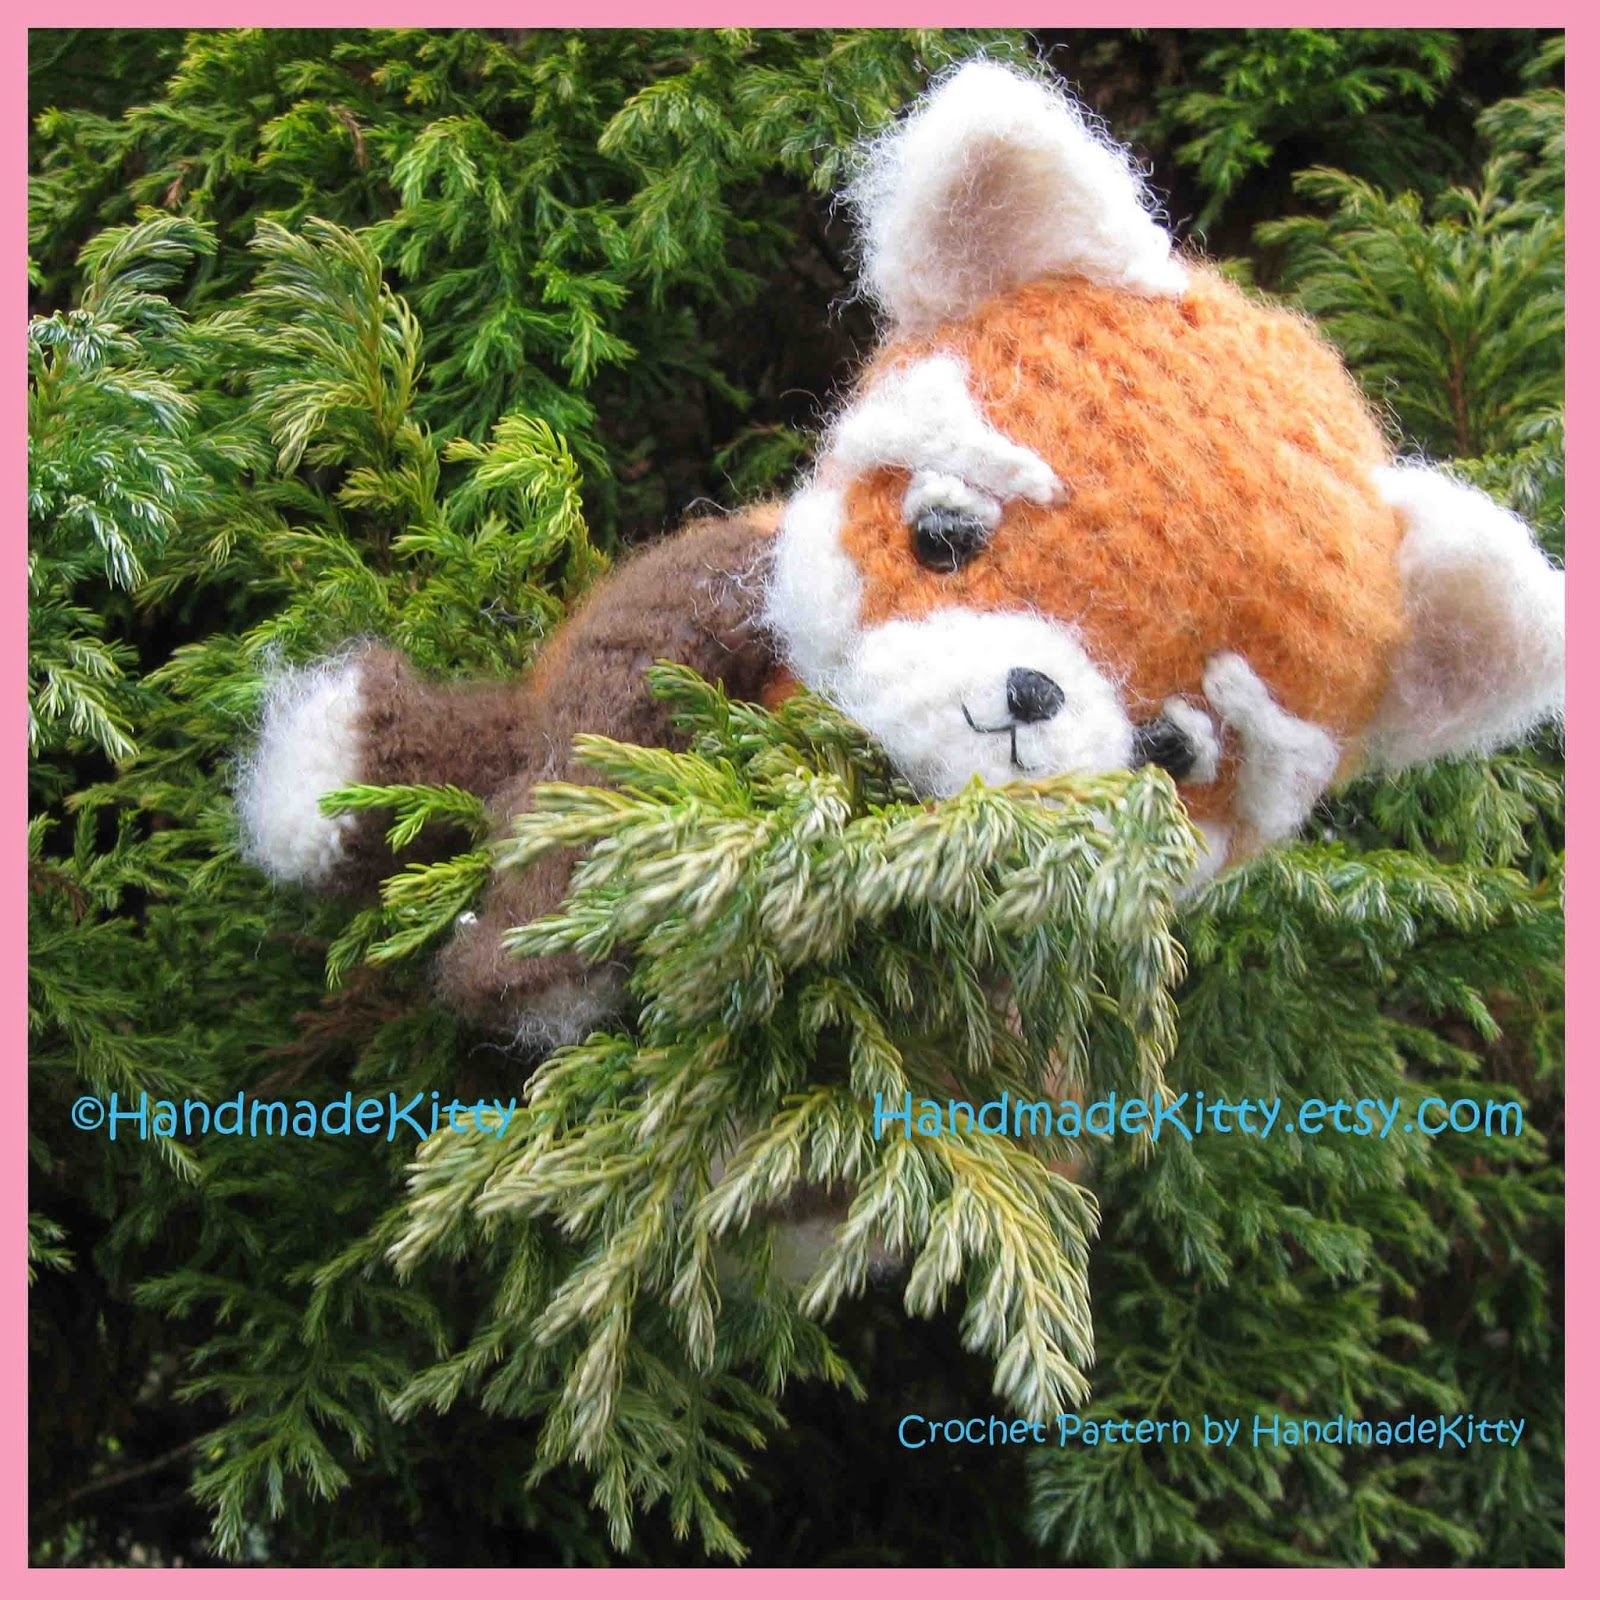 Amigurumi Free Patterns Pokemon : HandmadeKitty: Red Panda Amigurumi PDF Crochet Pattern by ...